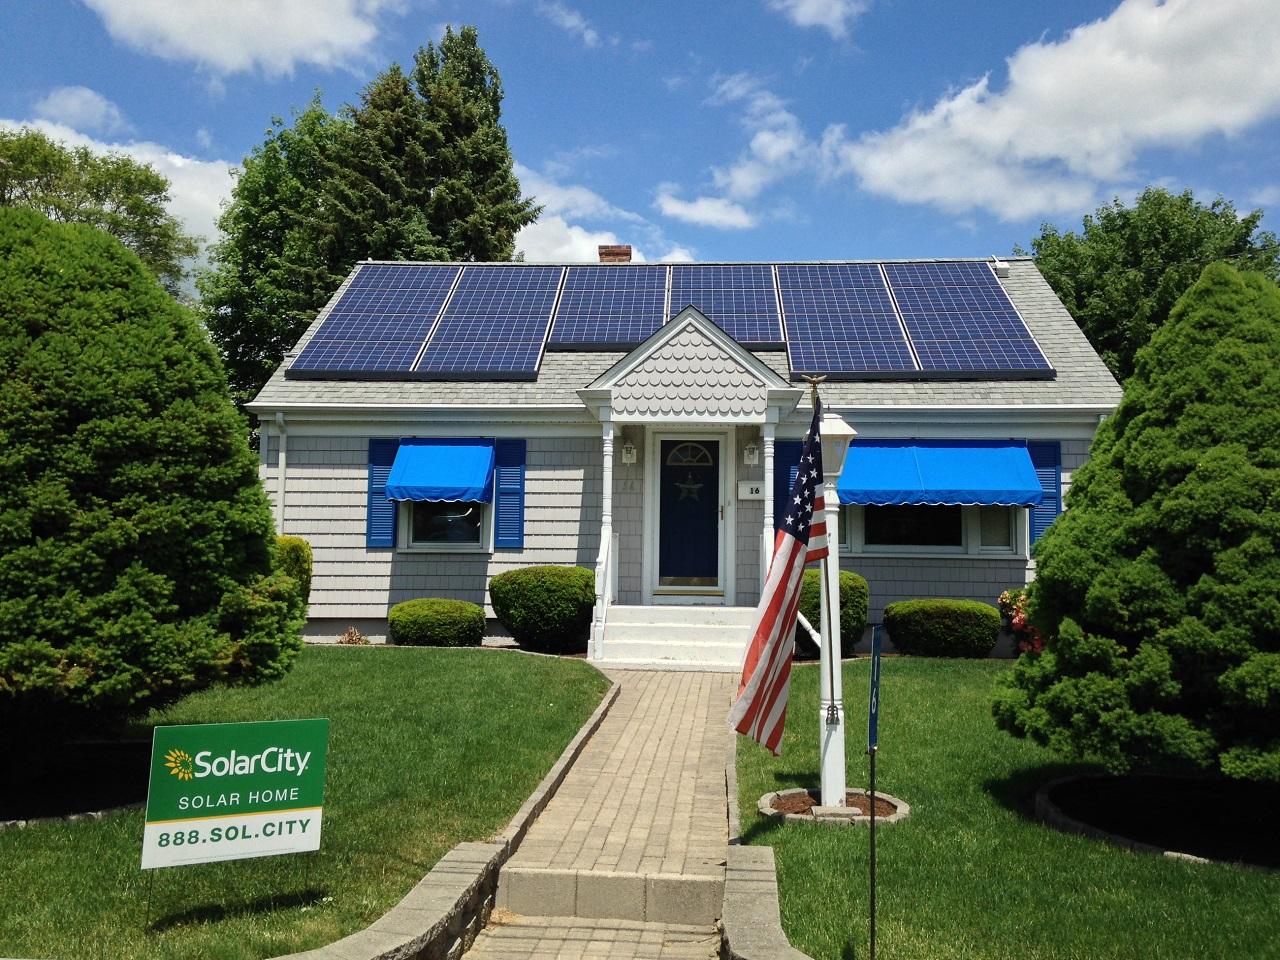 solarcity compañia tesla